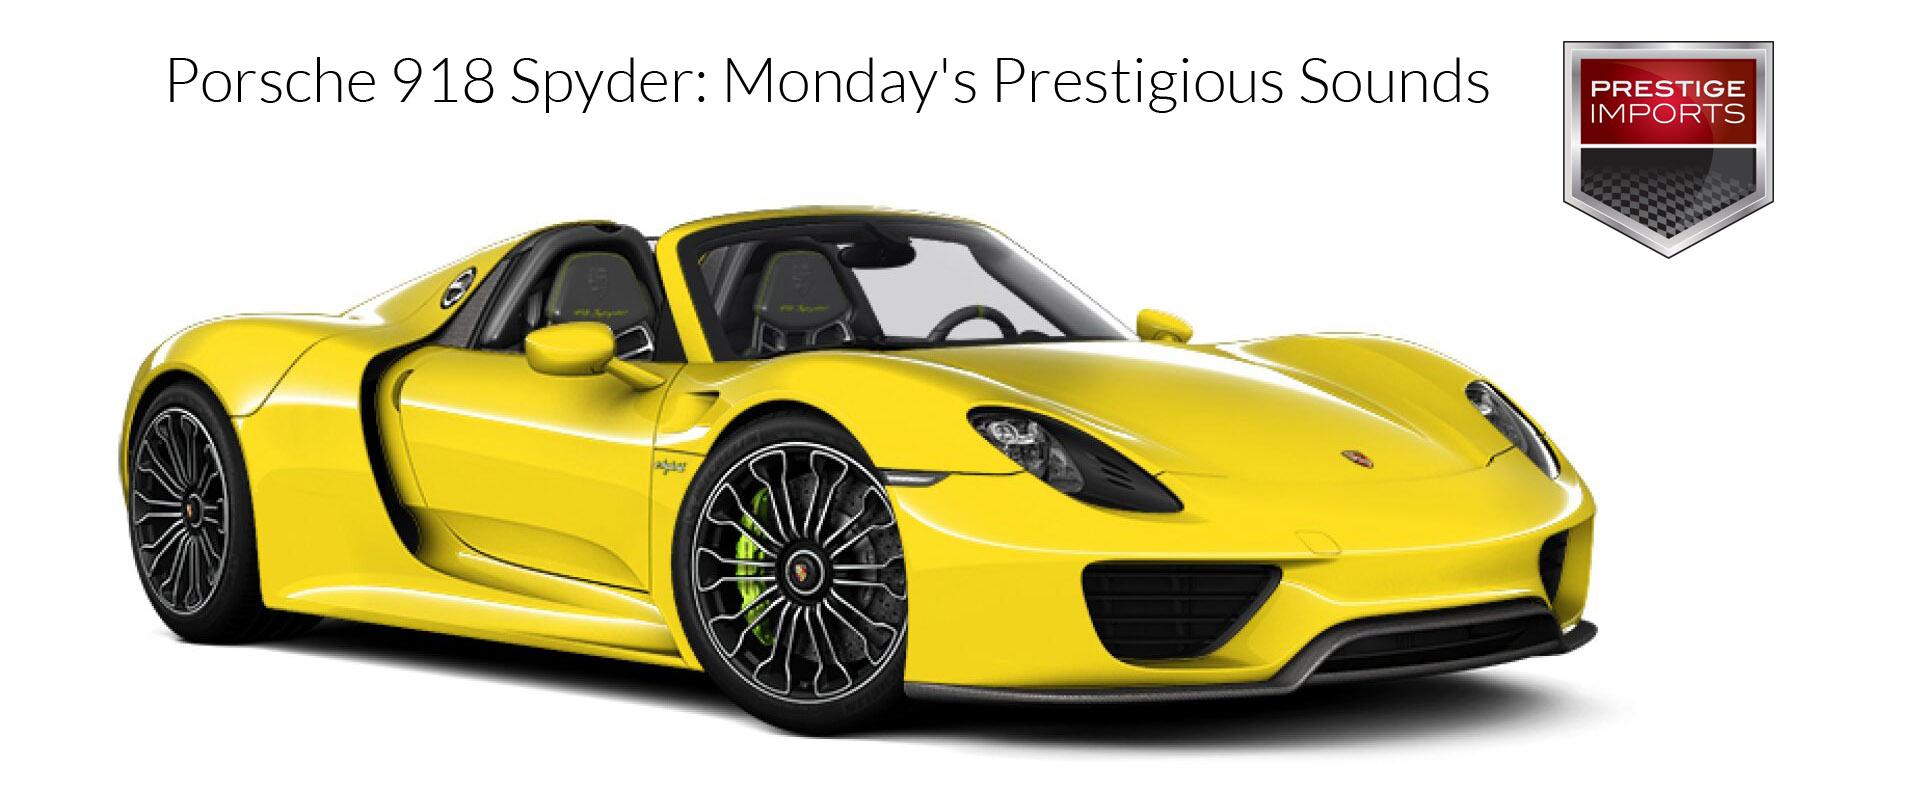 Porsche 918 Spyder: